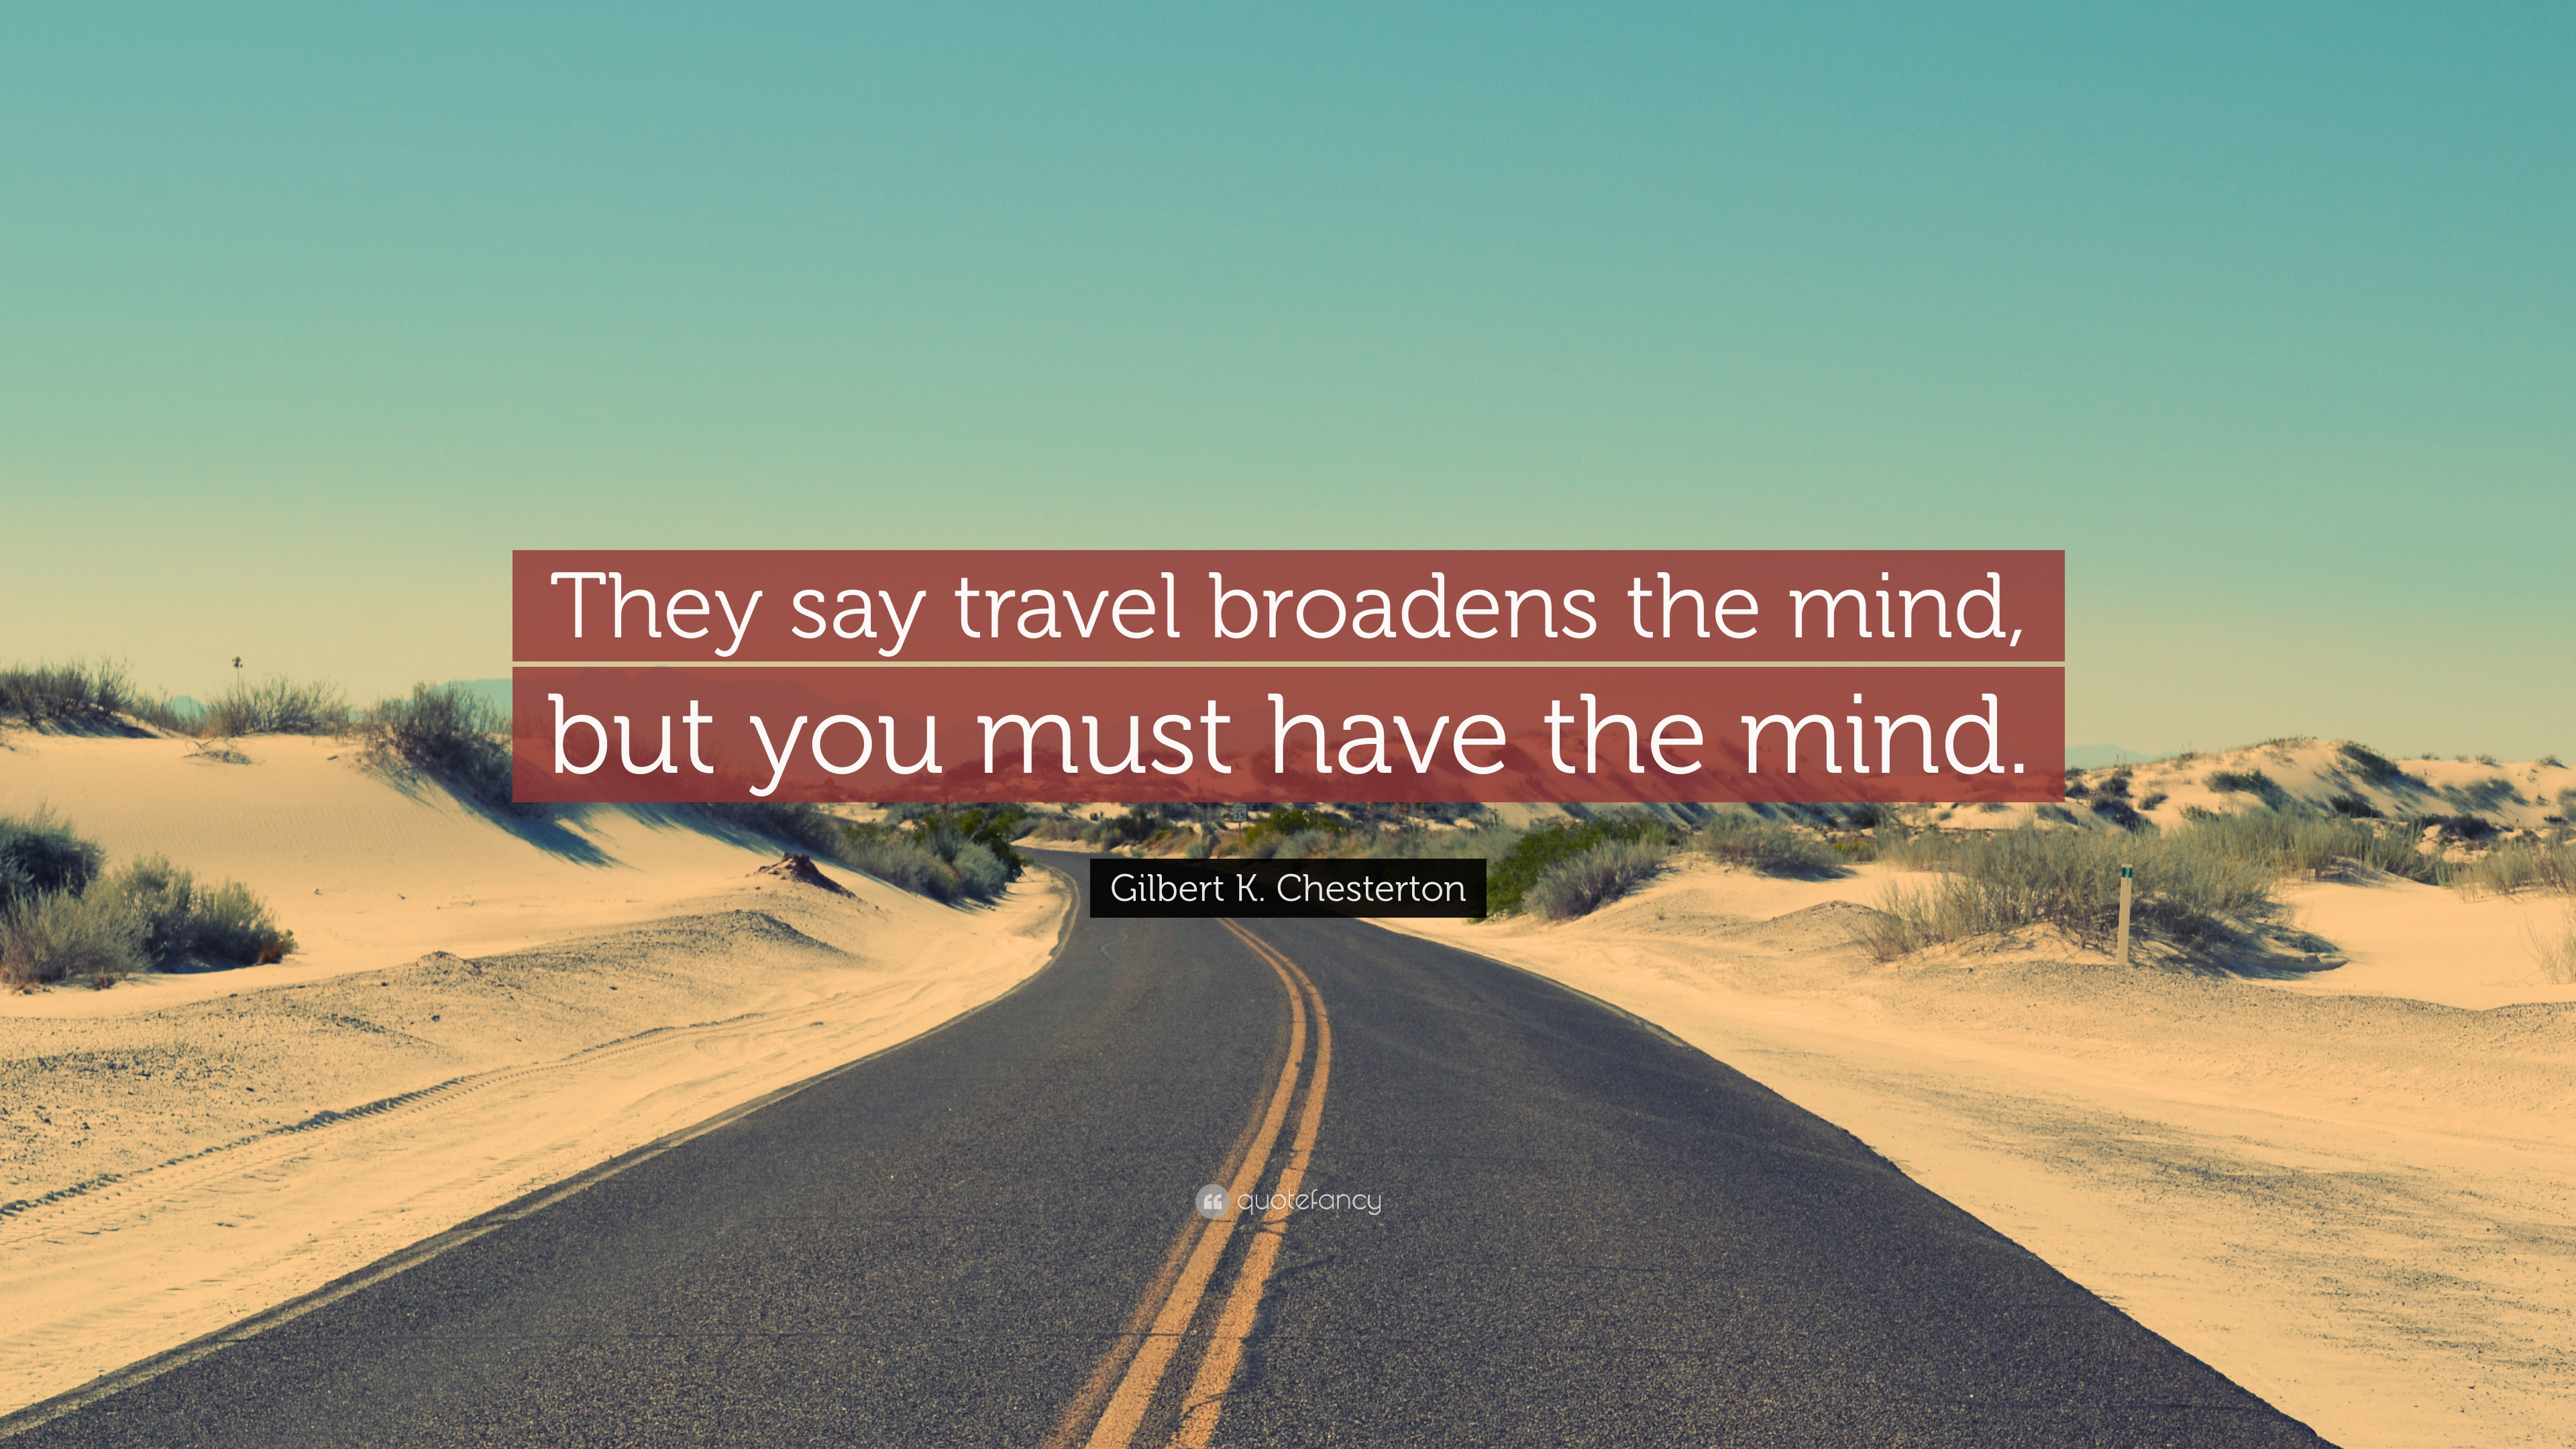 Does Travel Broaden The Mind?